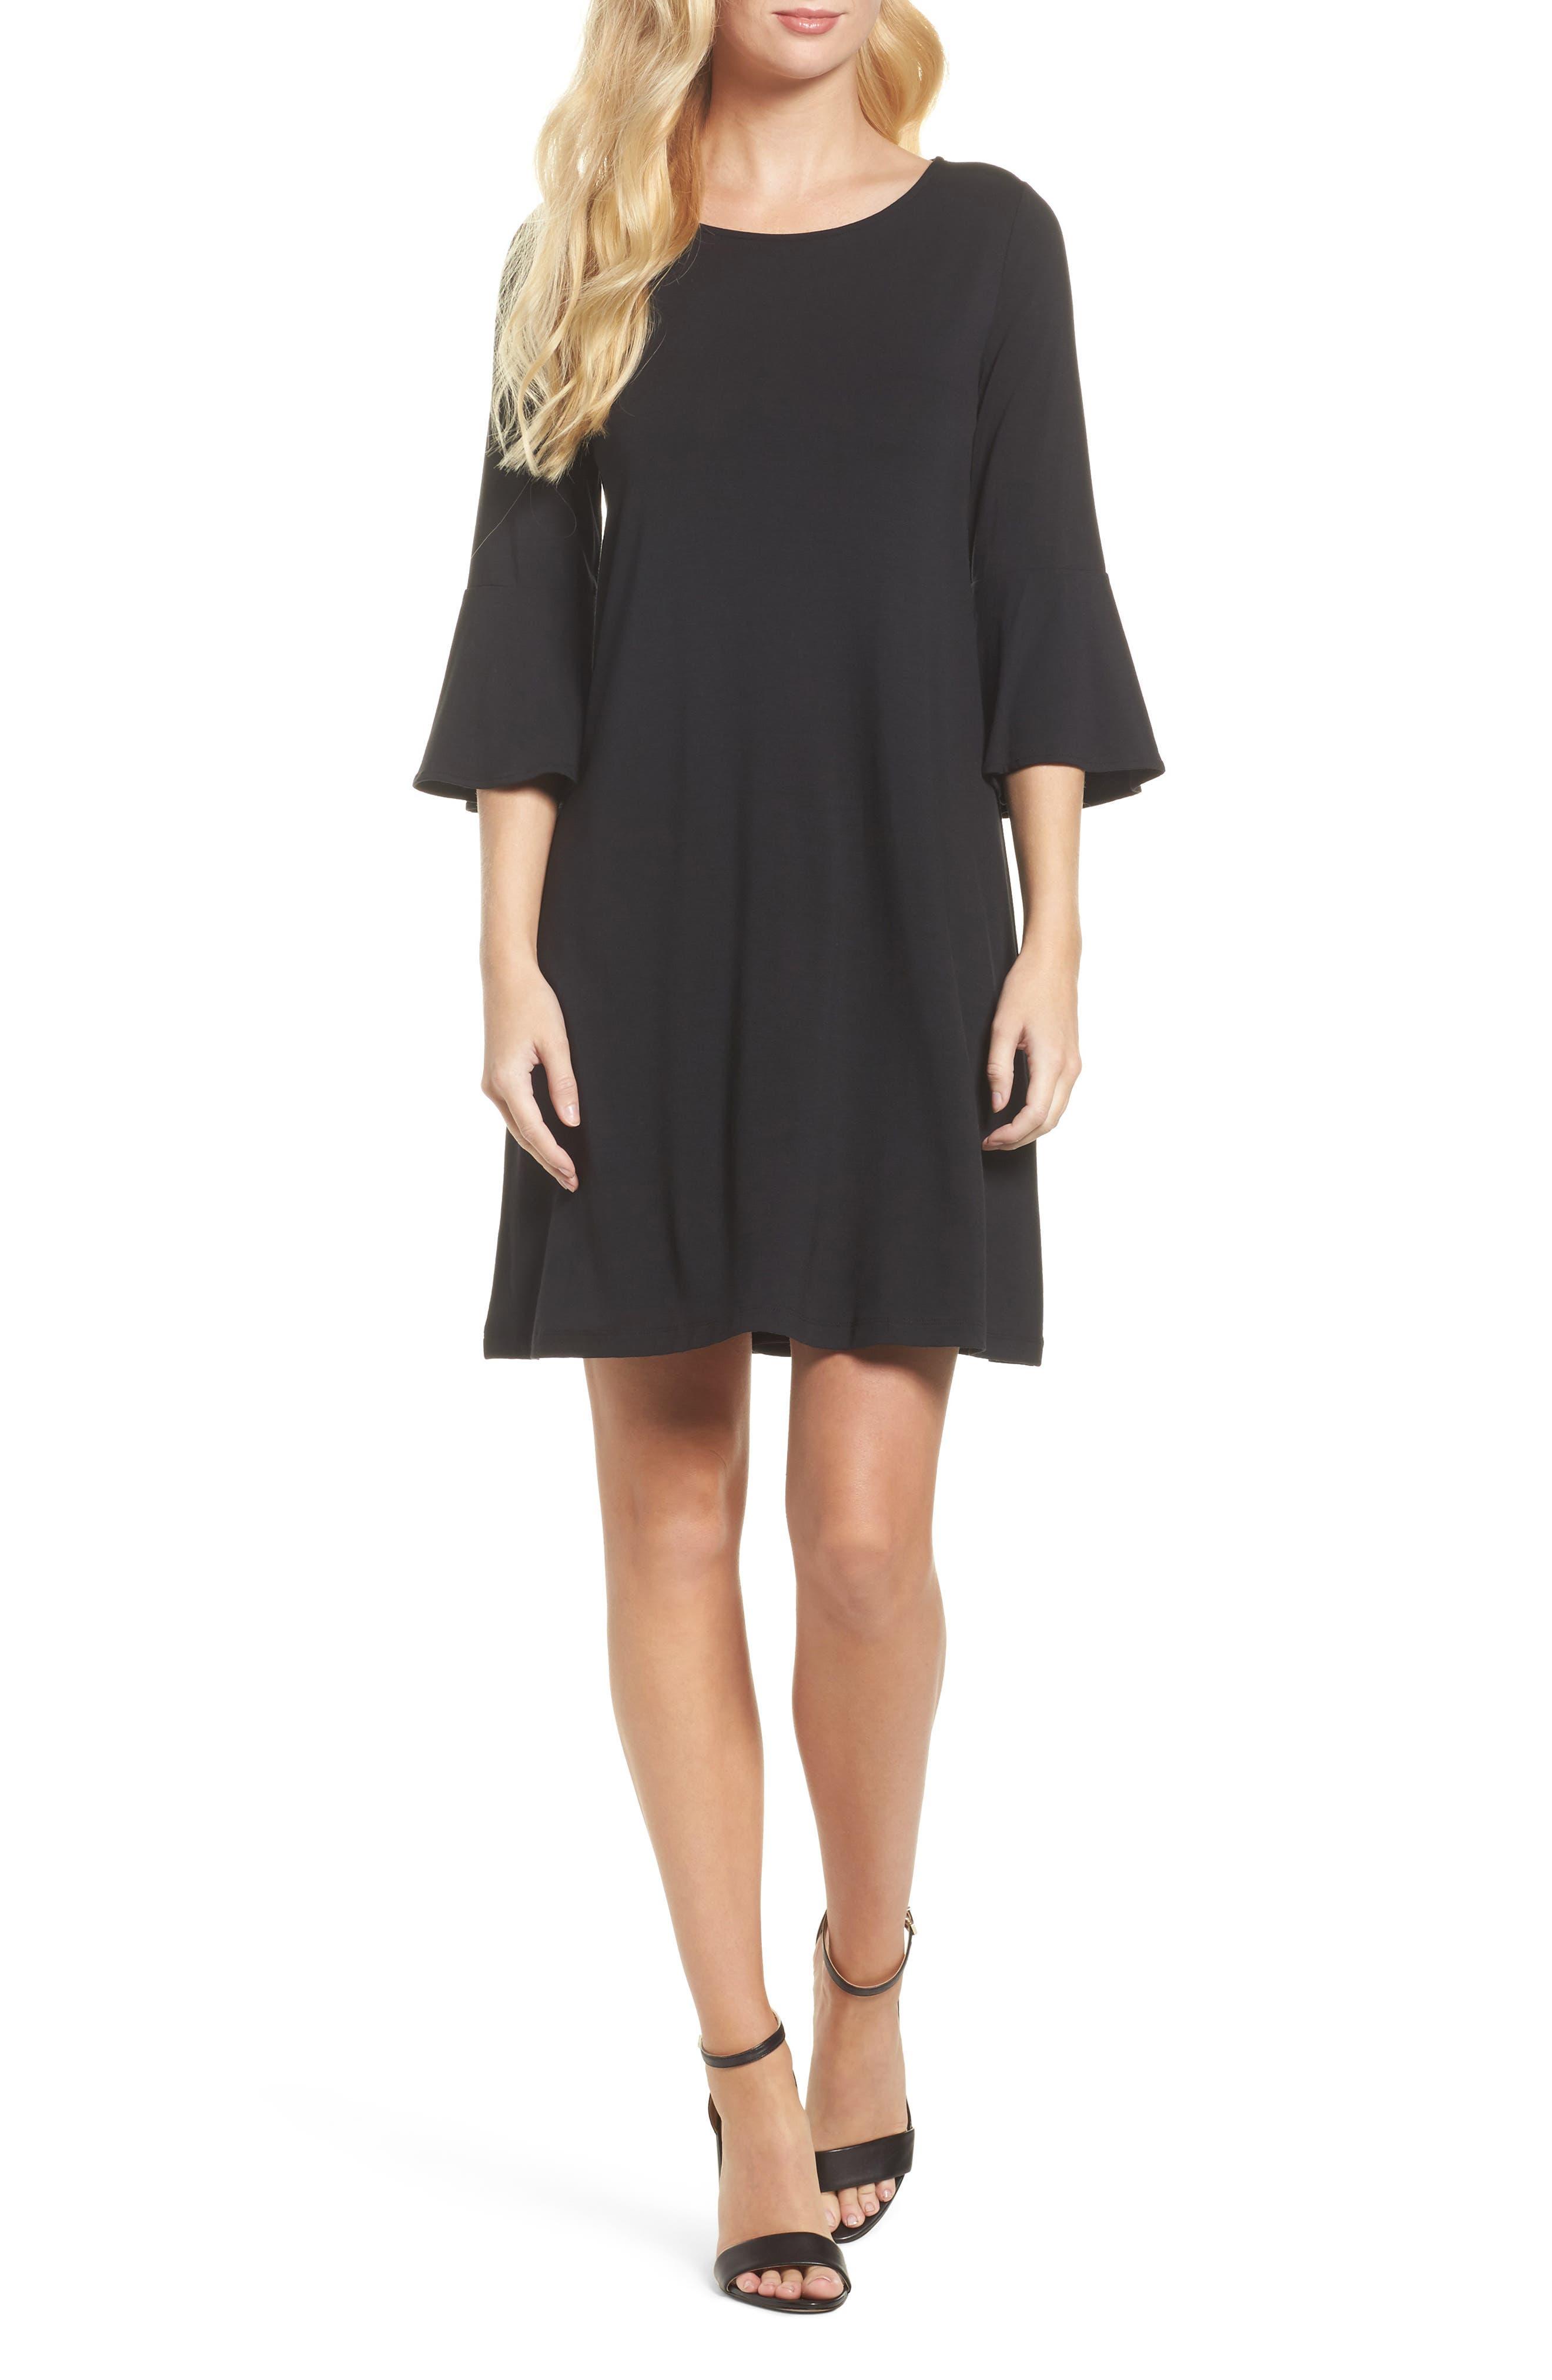 Lilly Pulitzer Ophelia Swing Dress, Black